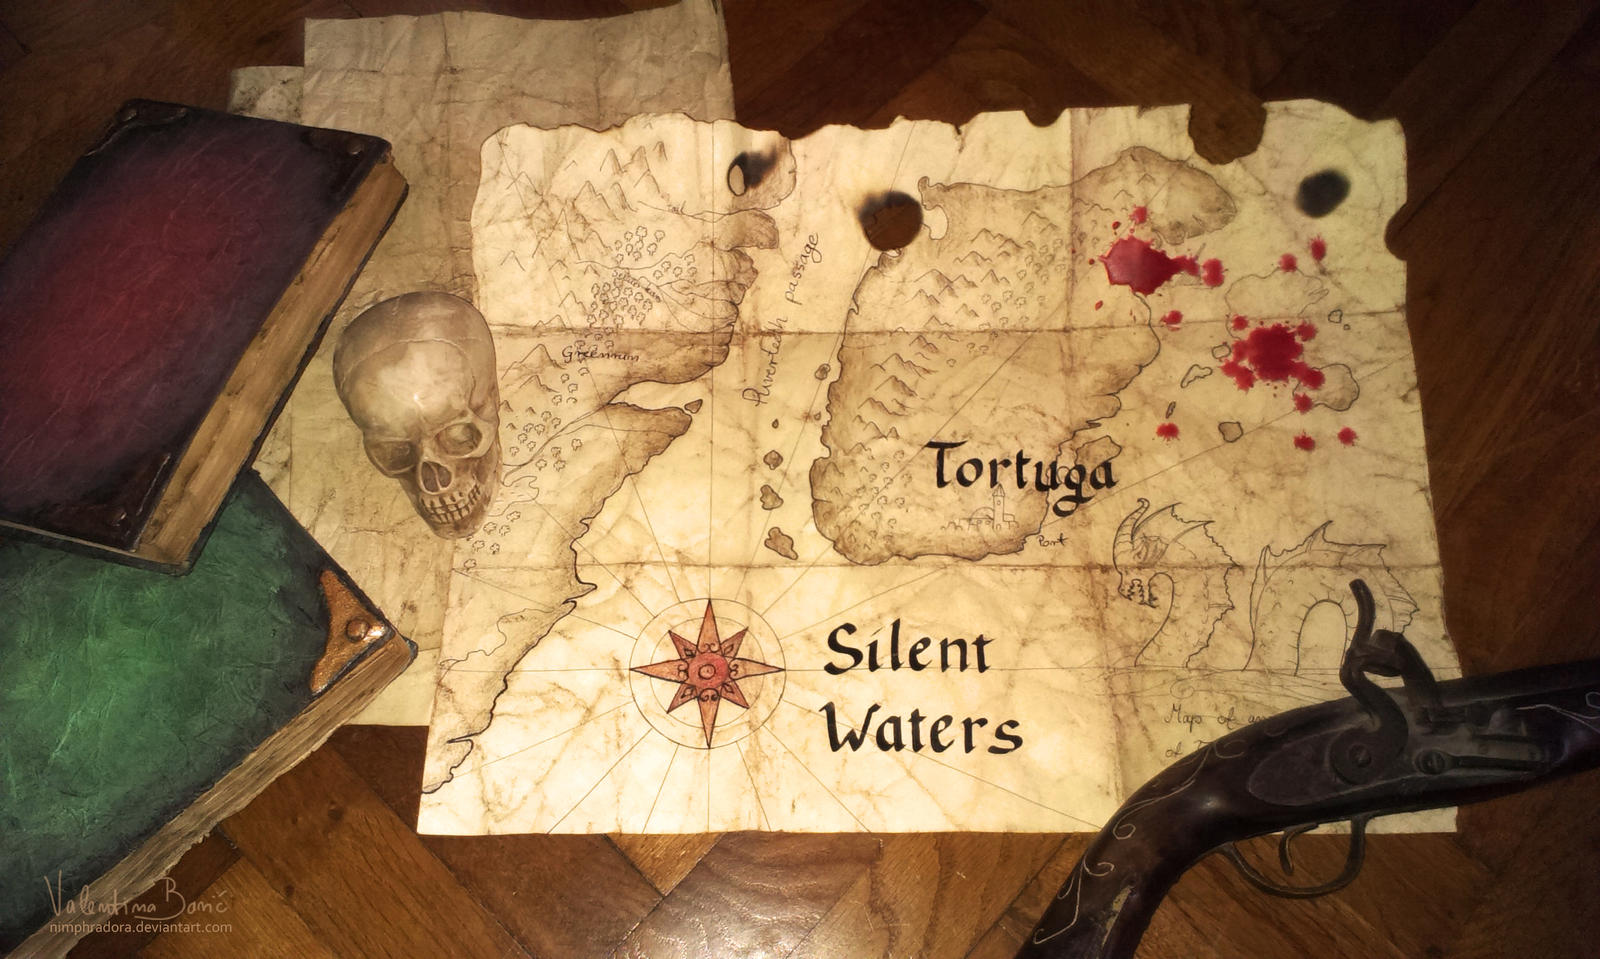 Pirate map by Nimphradora